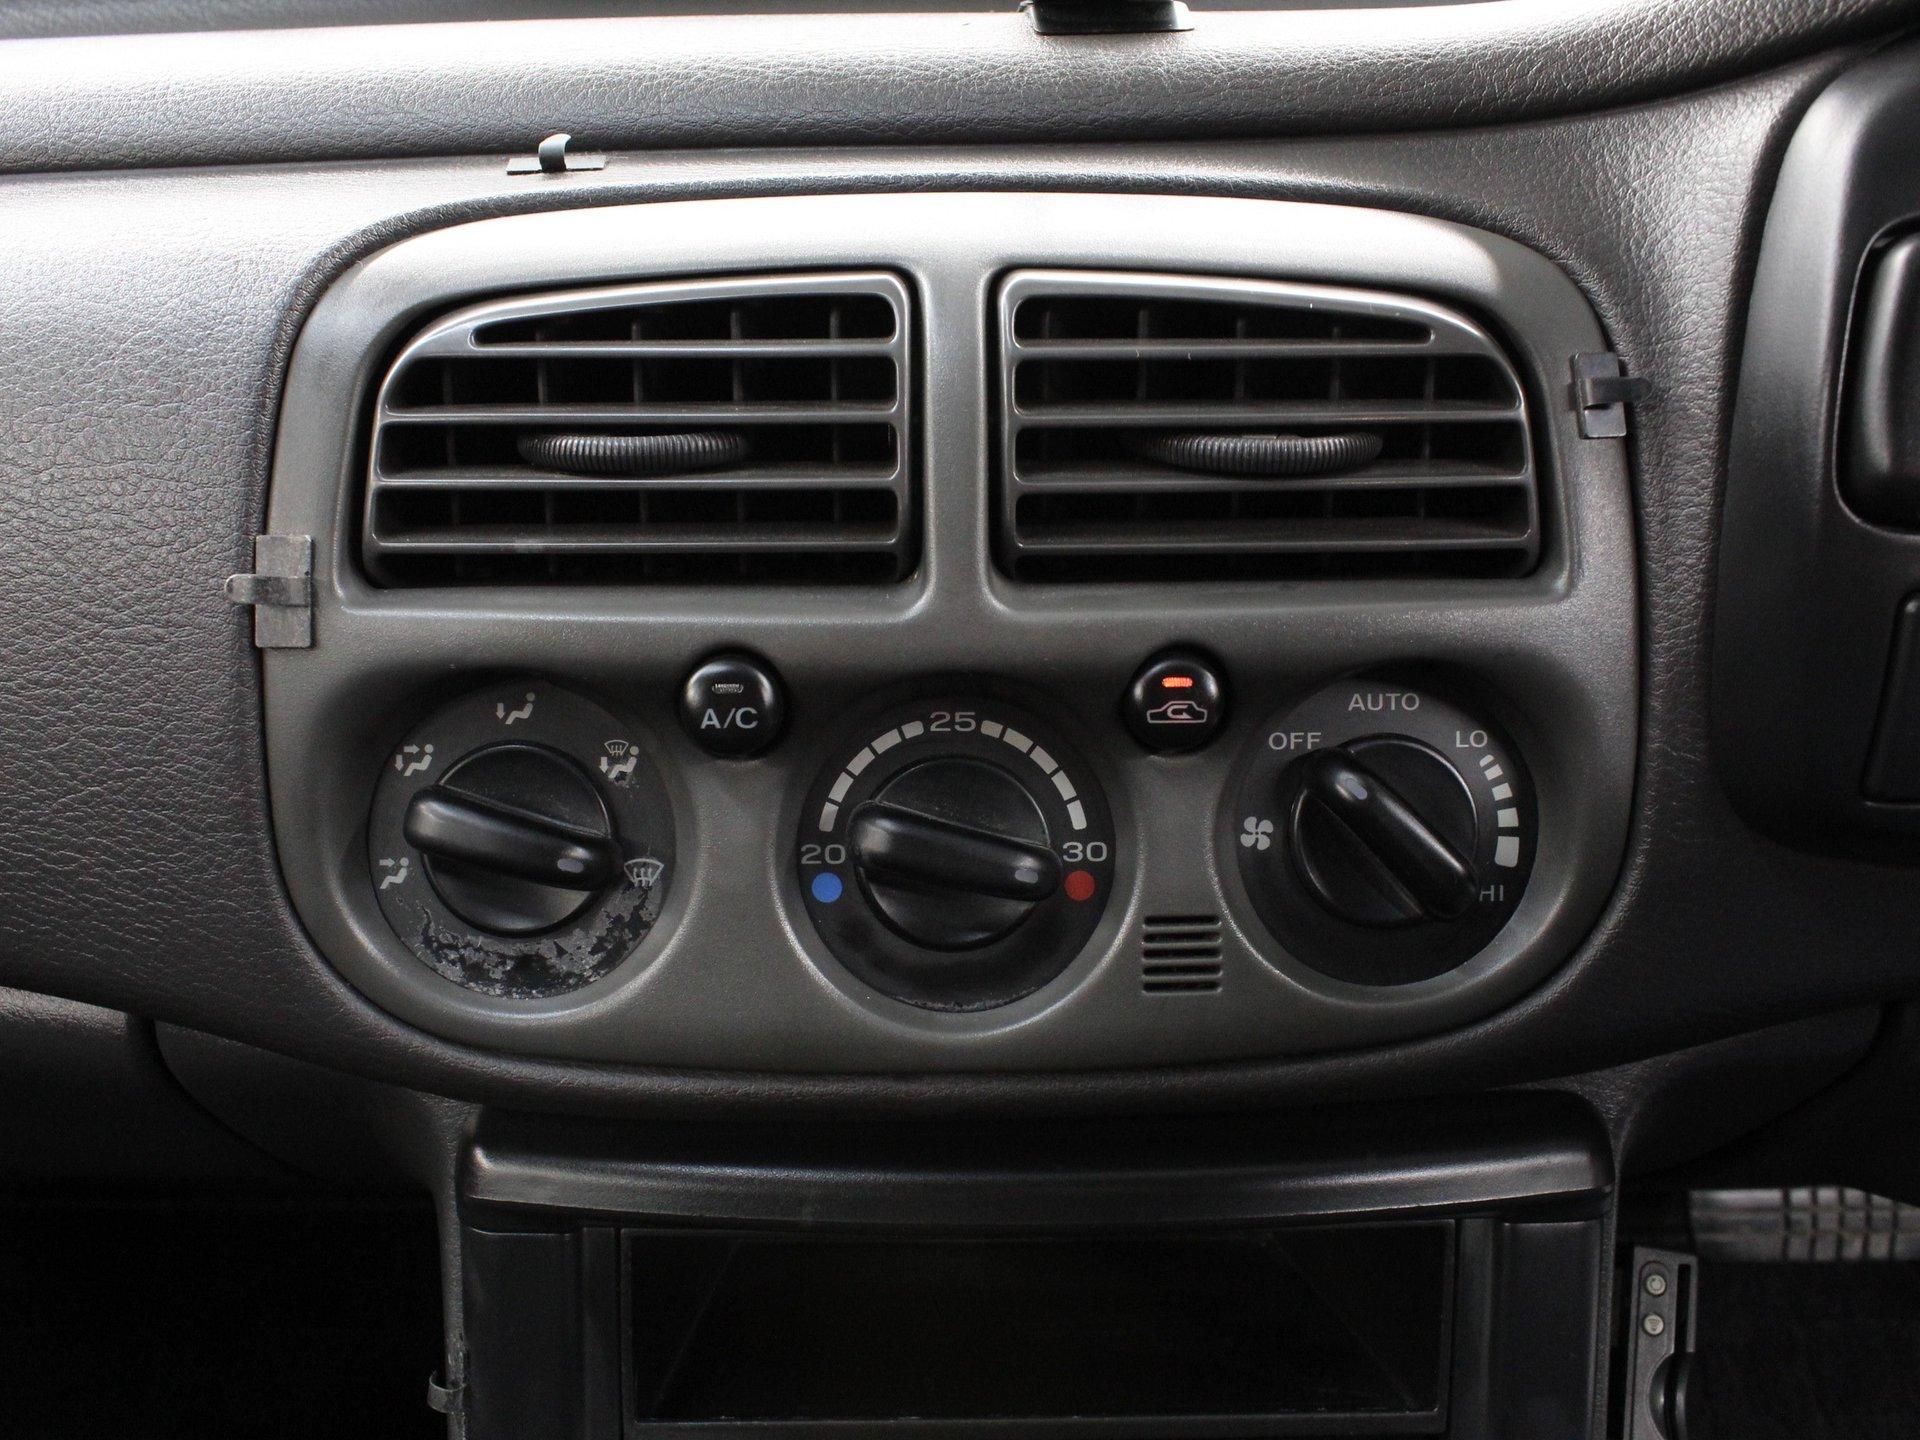 1995 Subaru Impreza